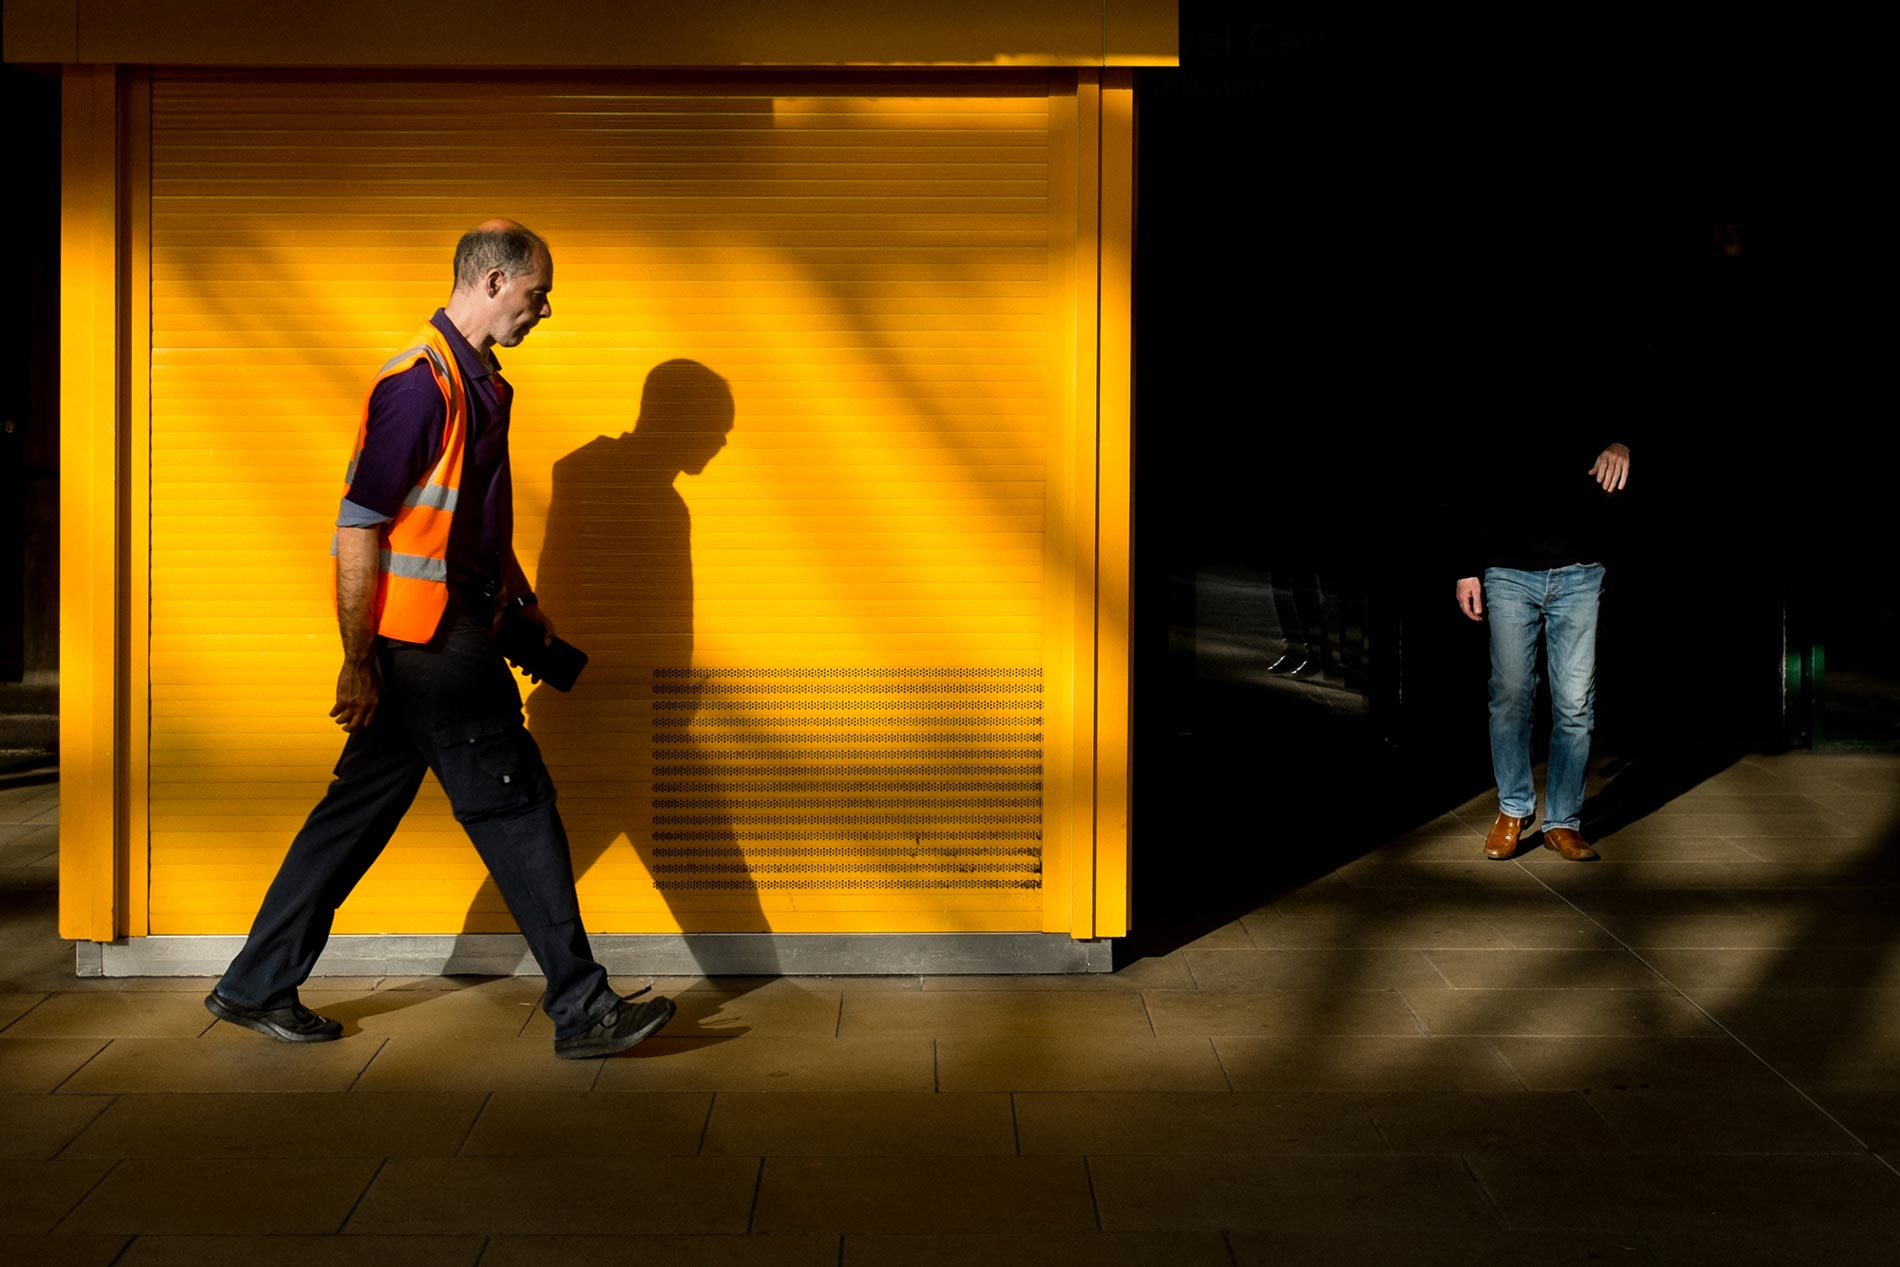 Railworker - Waverley Station, Edinburgh